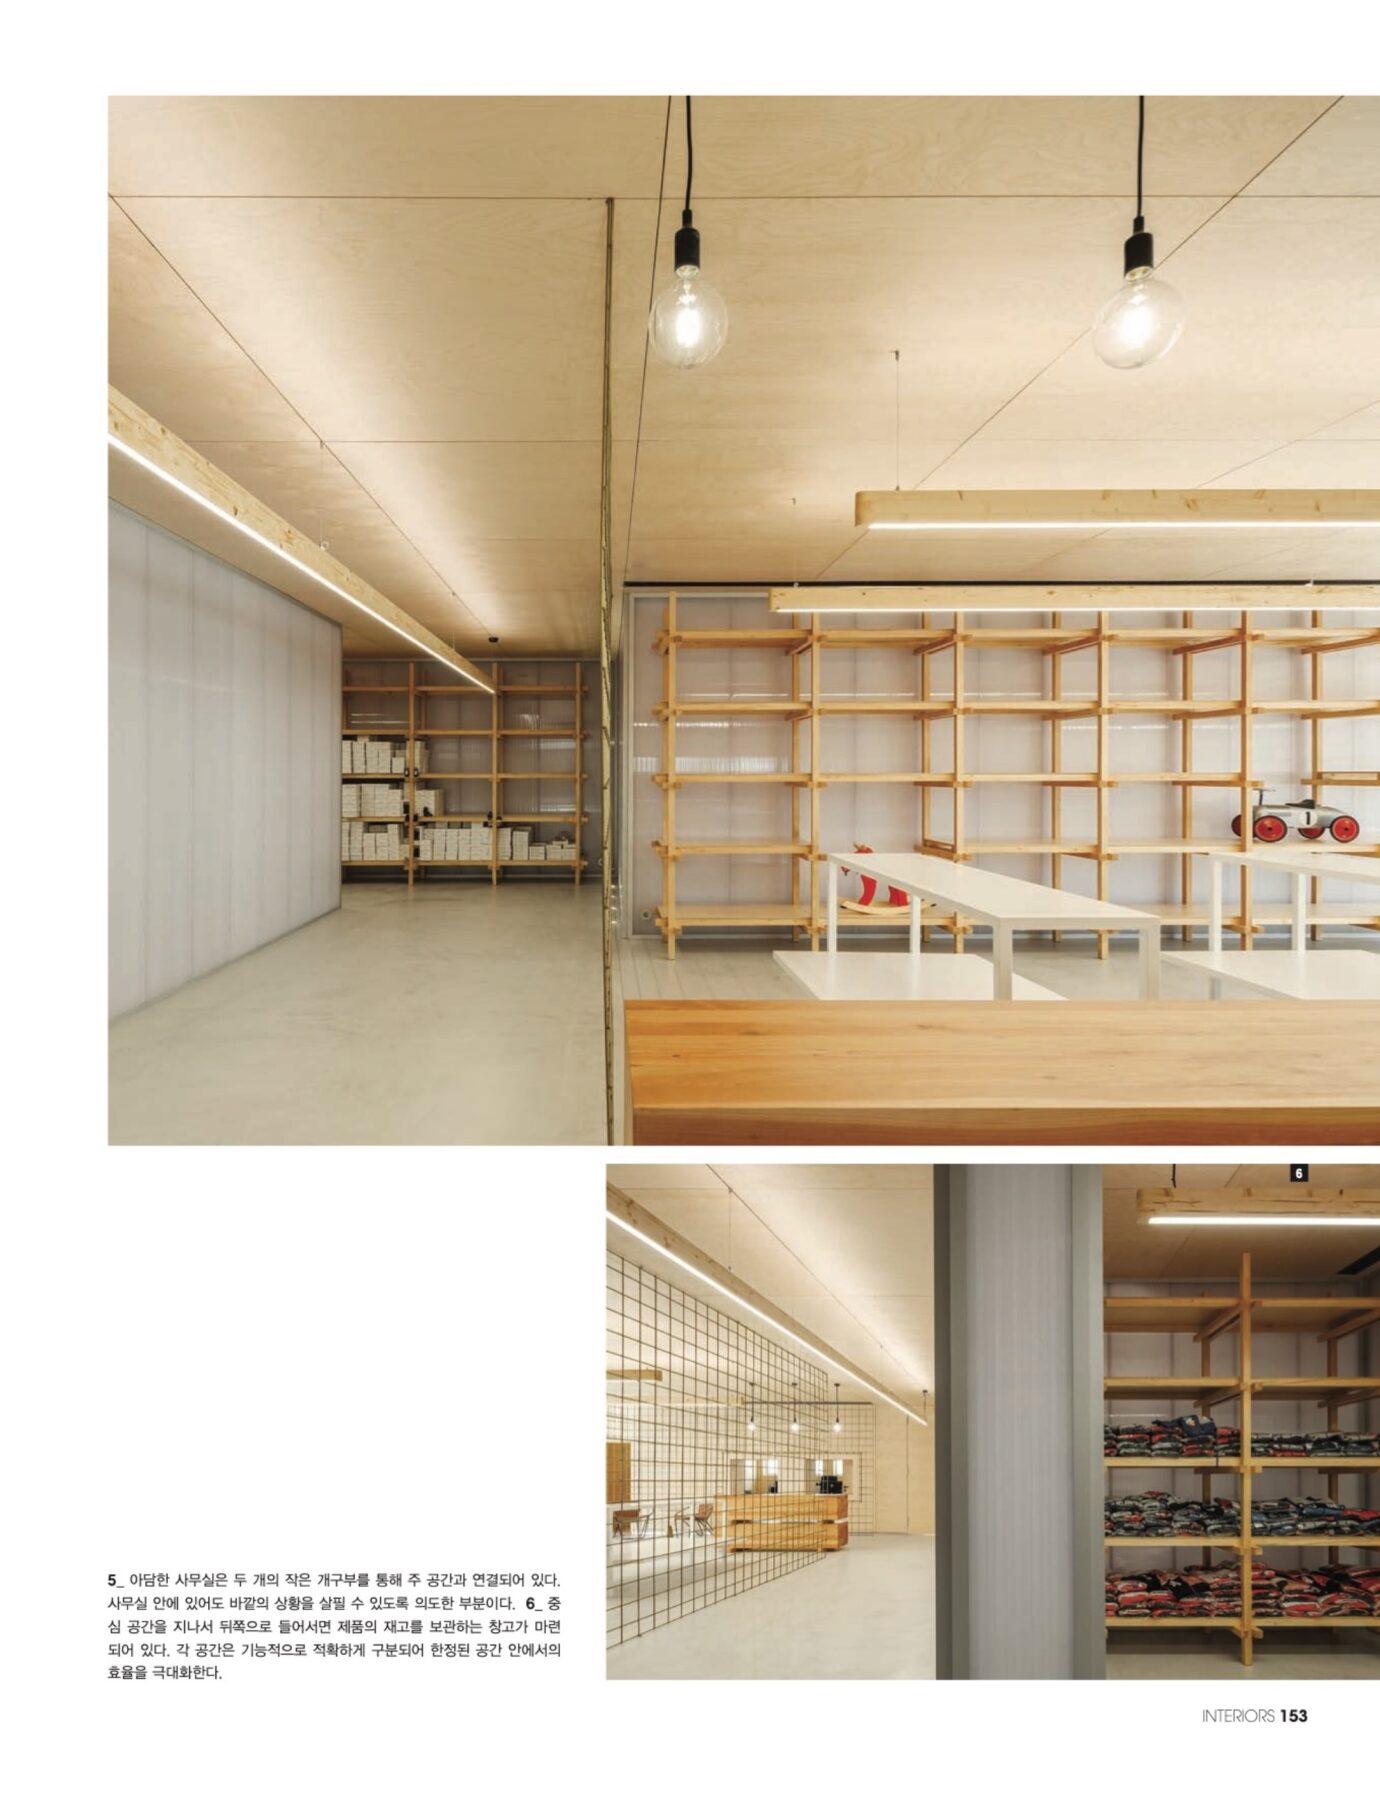 interiors korea studere aramazens morinha 413 10 10